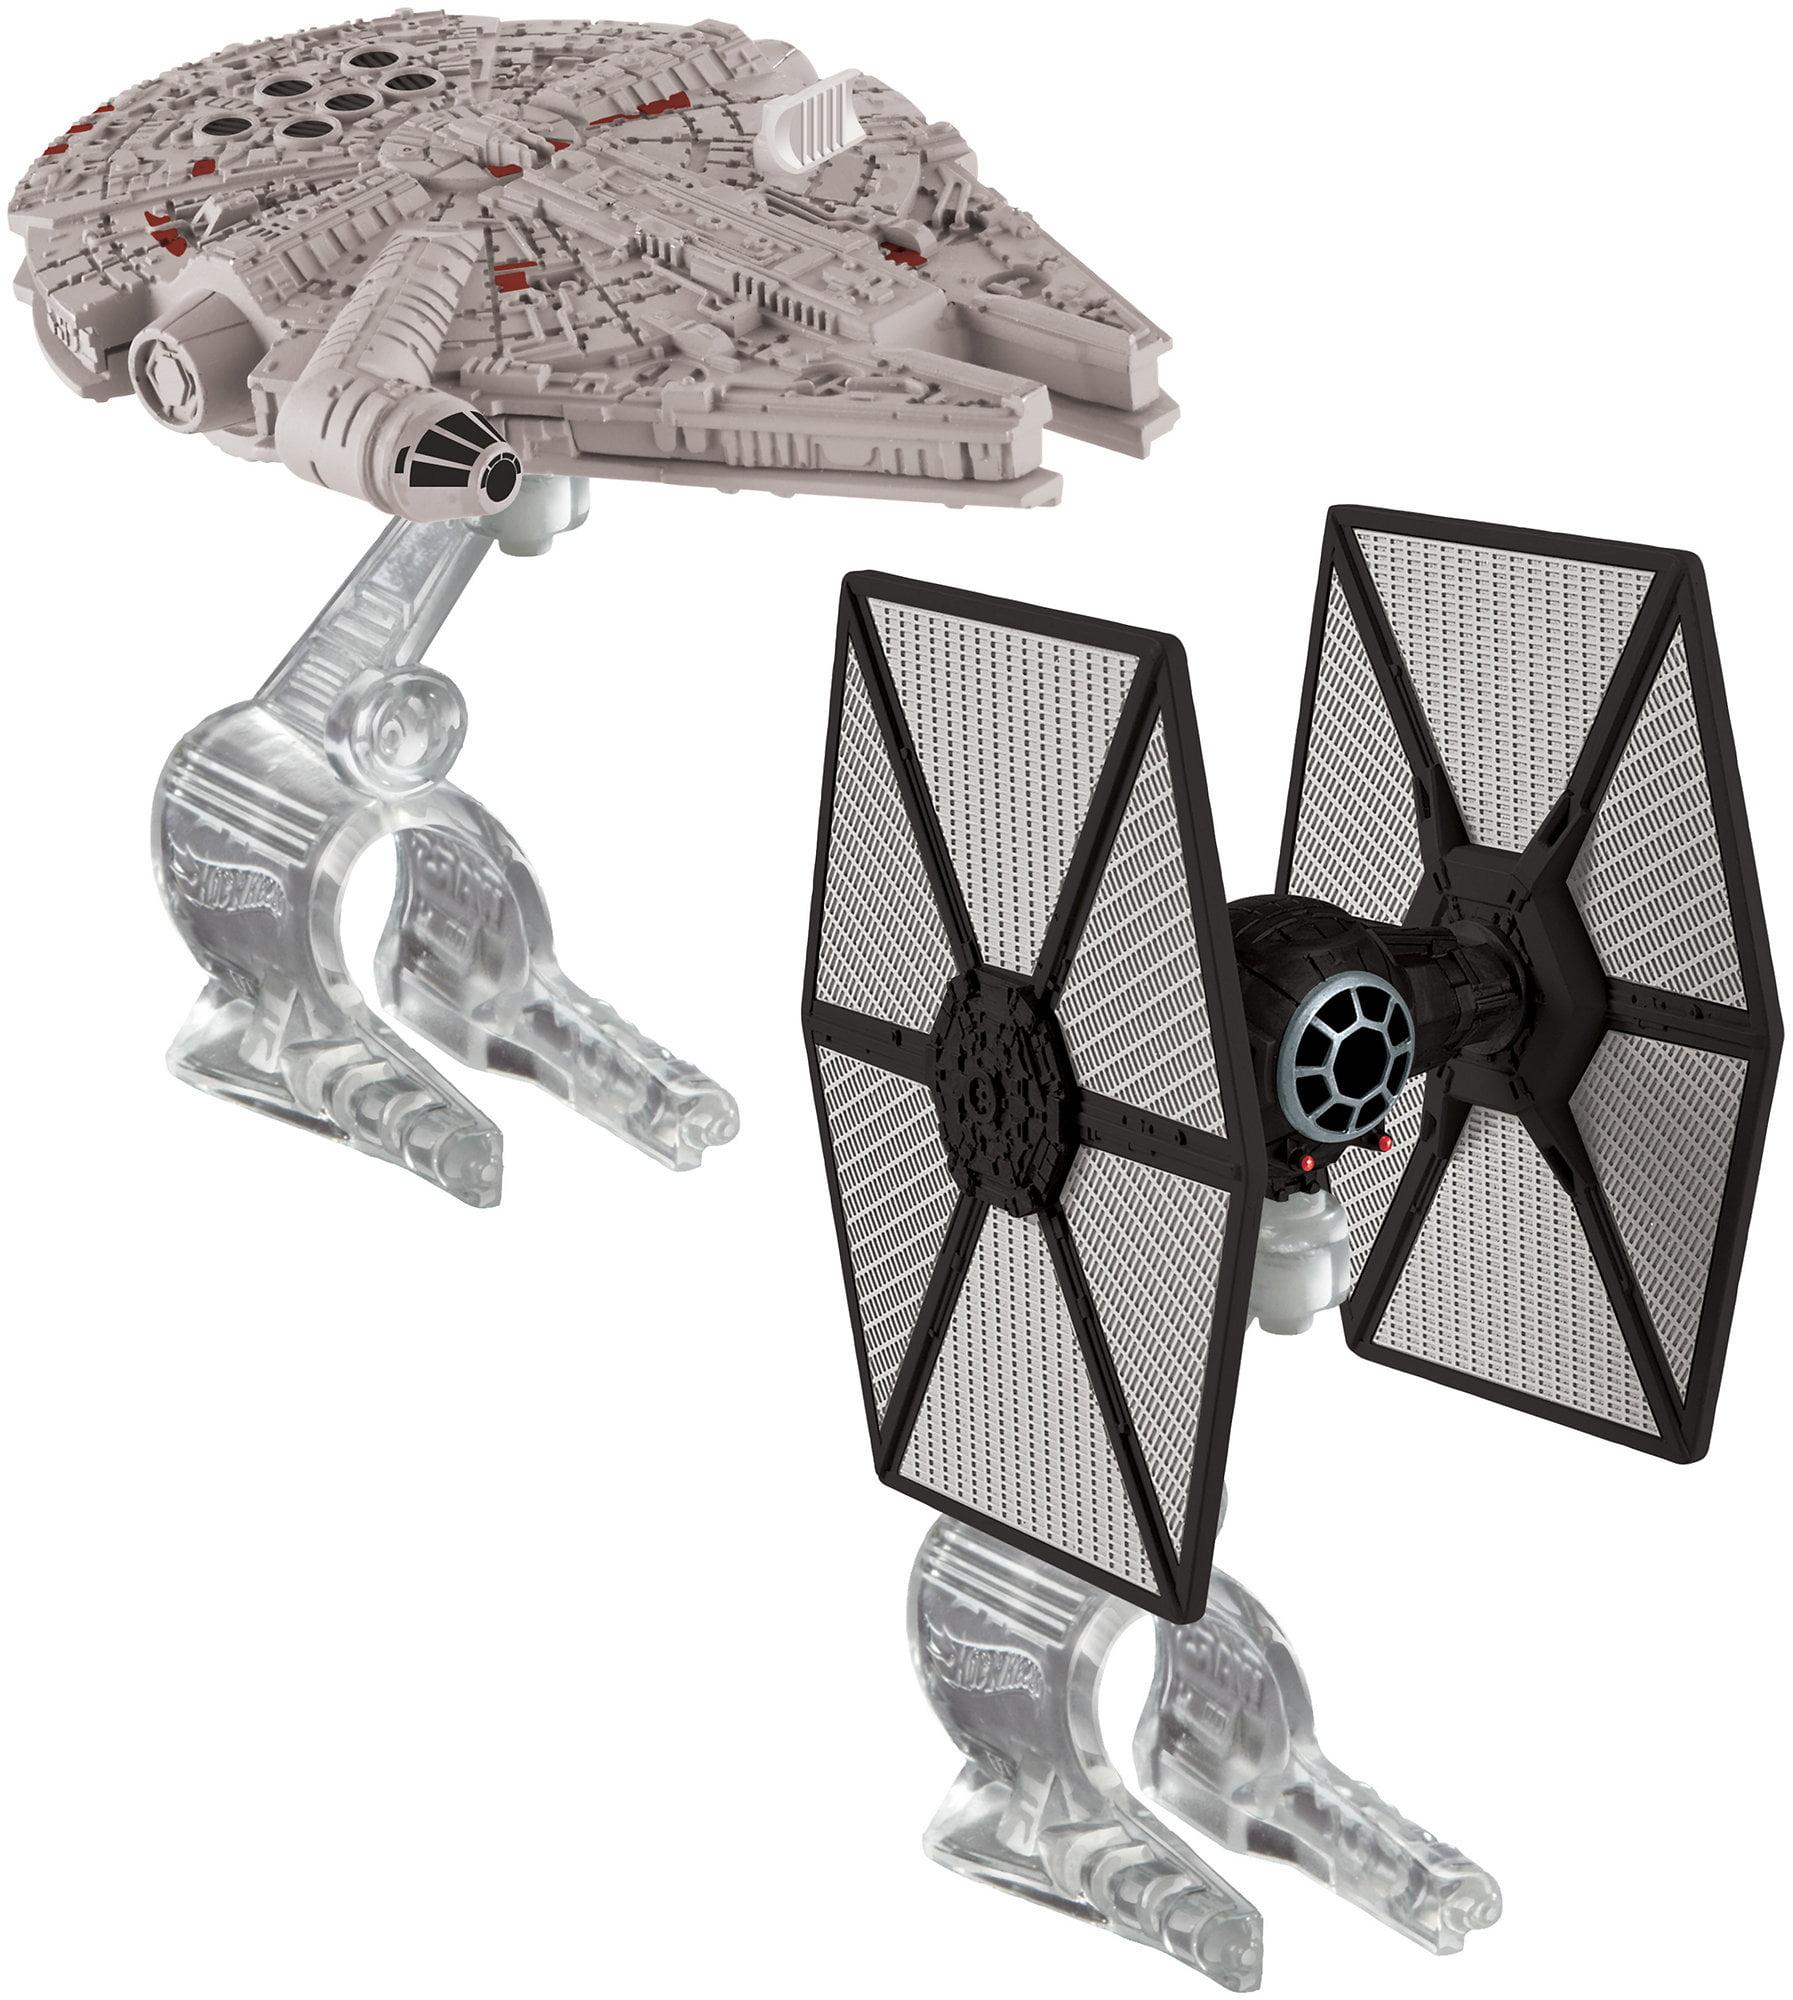 Hot Wheels Star Wars First Order Tie Fighter vs. Millennium Falcon by Mattel